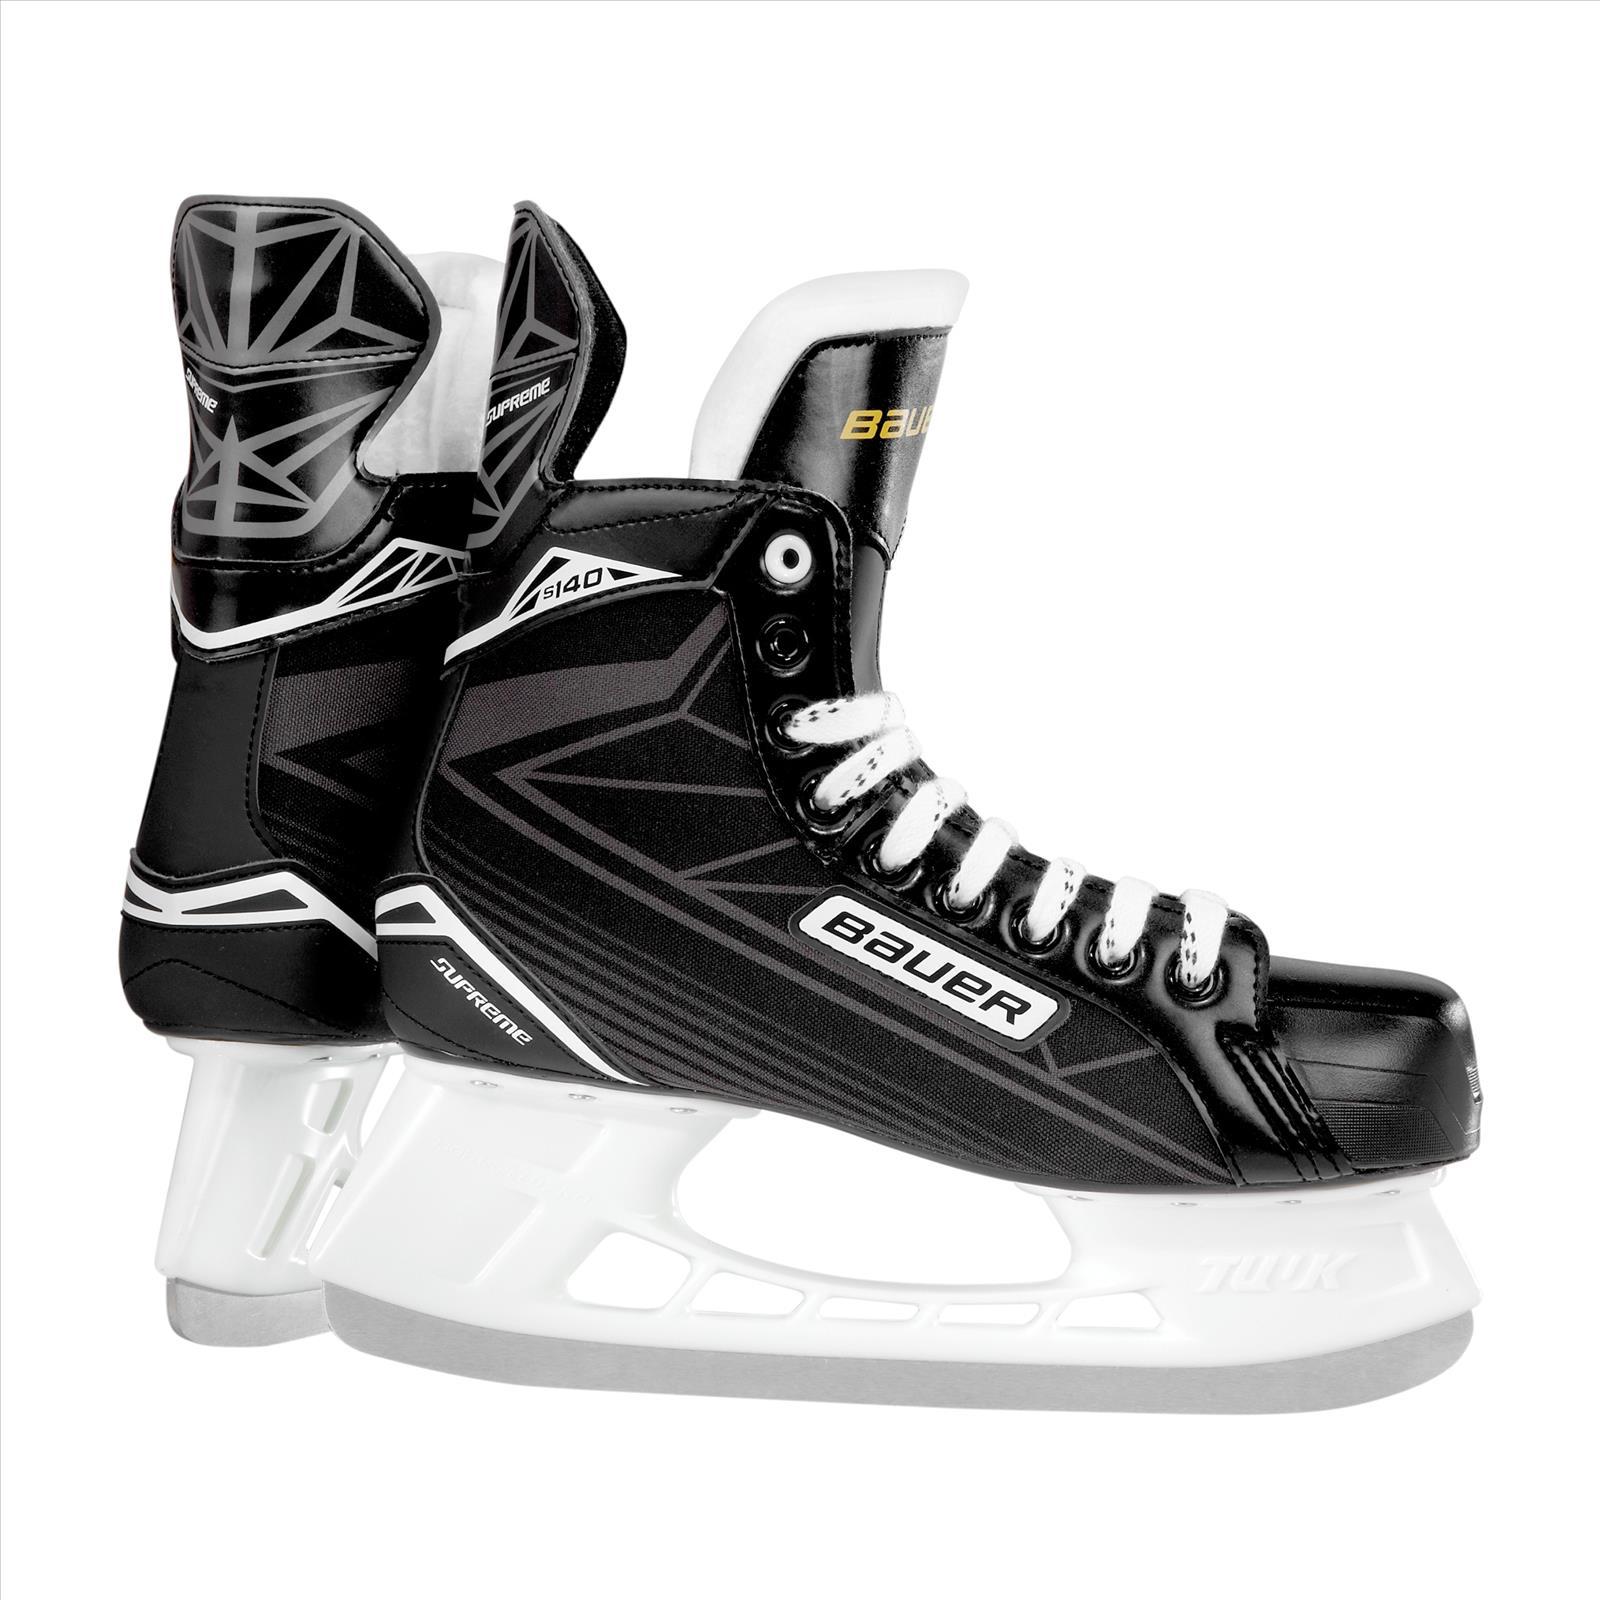 9f349b0e0a778 Bauer Supreme S140 JR - hokejové korčule